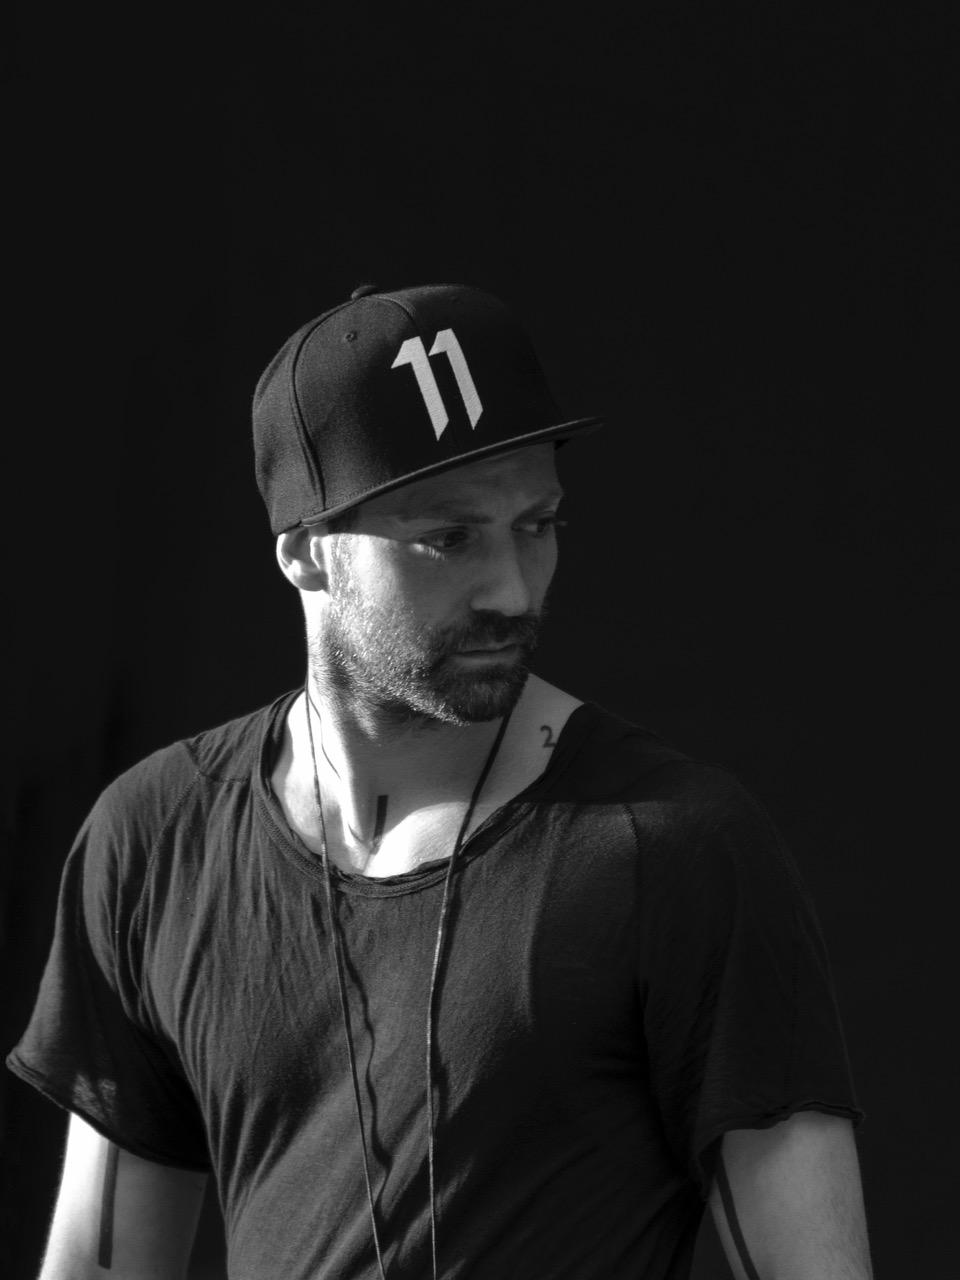 Fashion designer Boris Bidjan Saberi